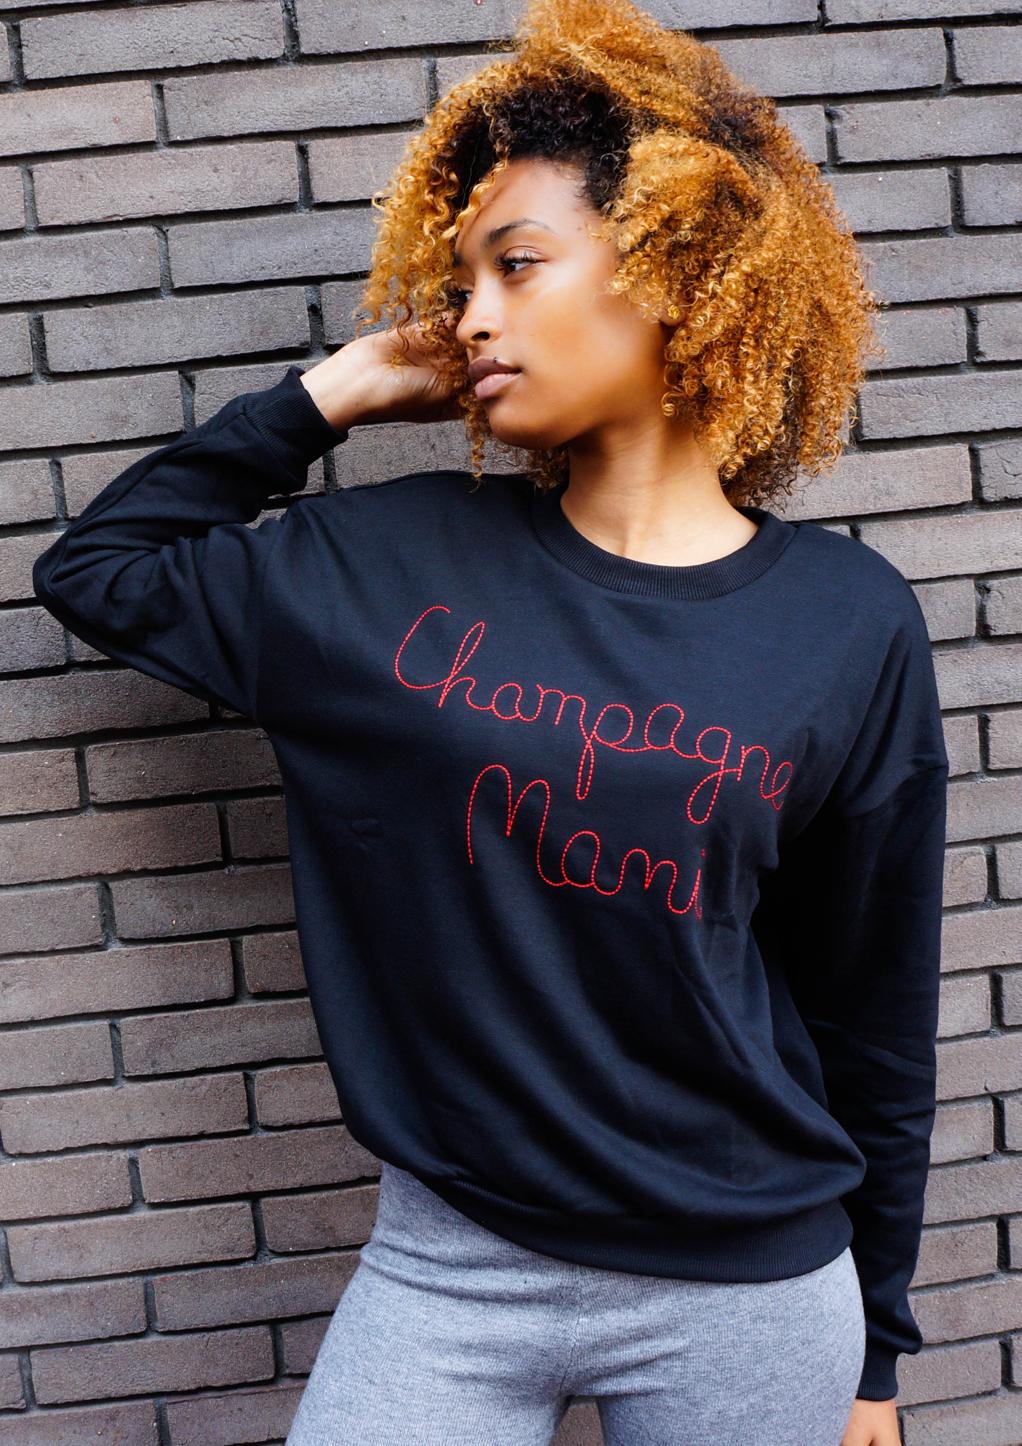 Zwarte trui met tekst champagne mami